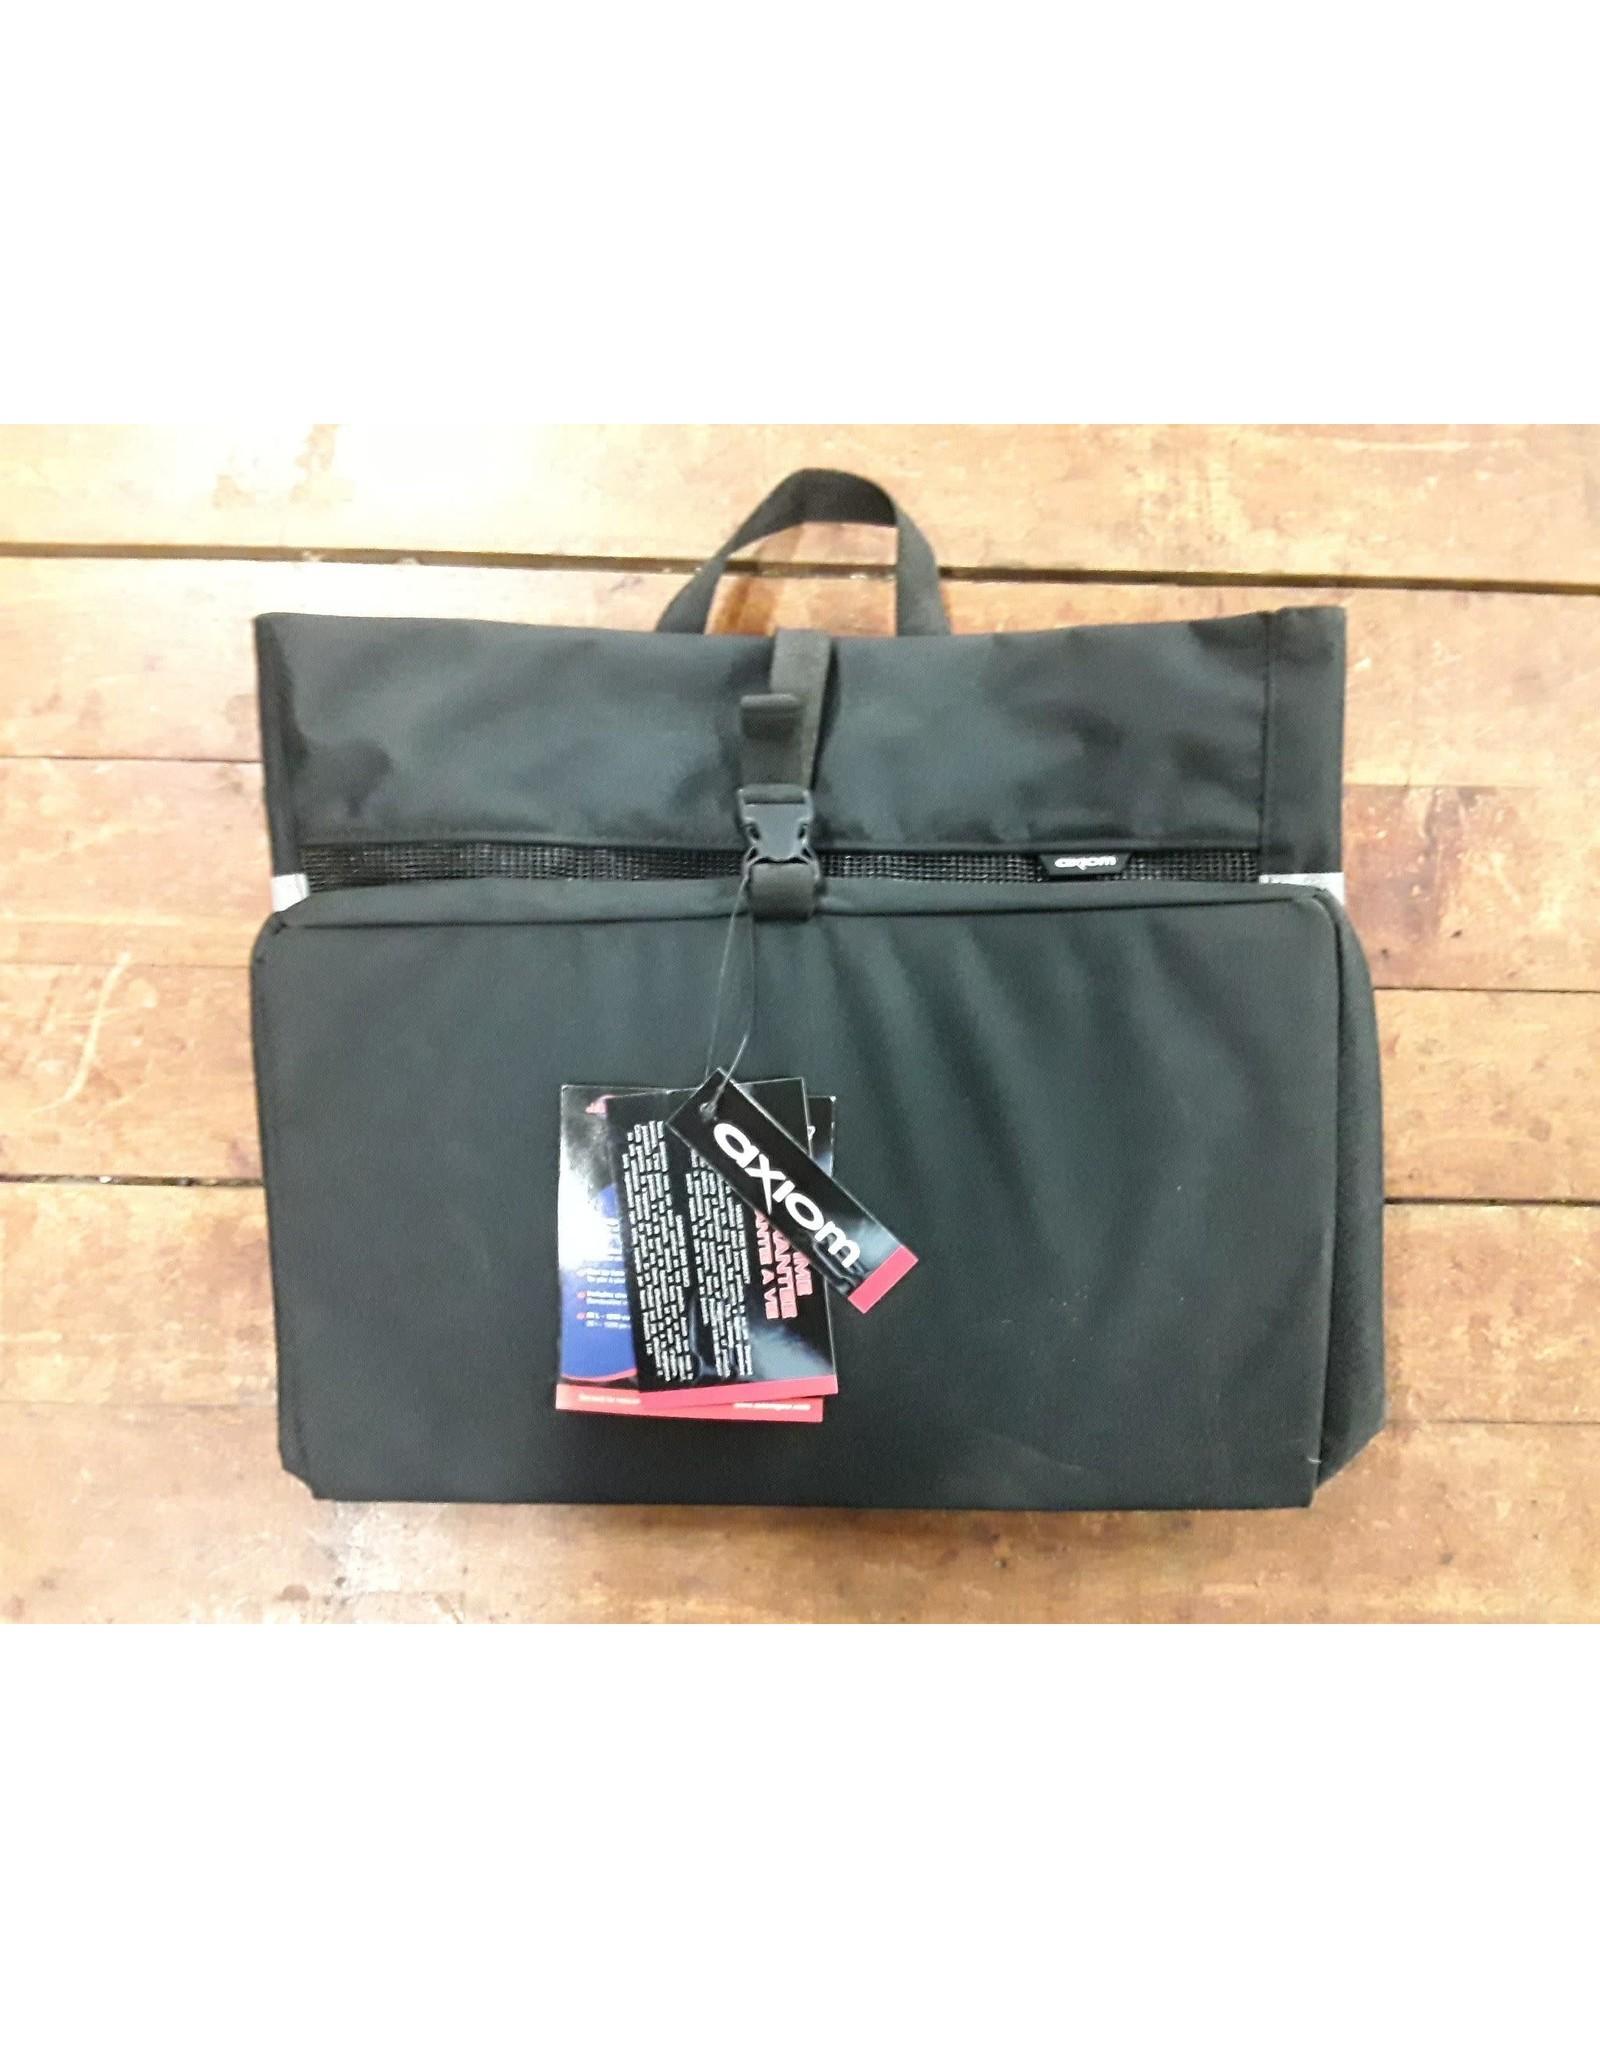 Axiom Axiom Hunter Grocery Bag Pannier - Black